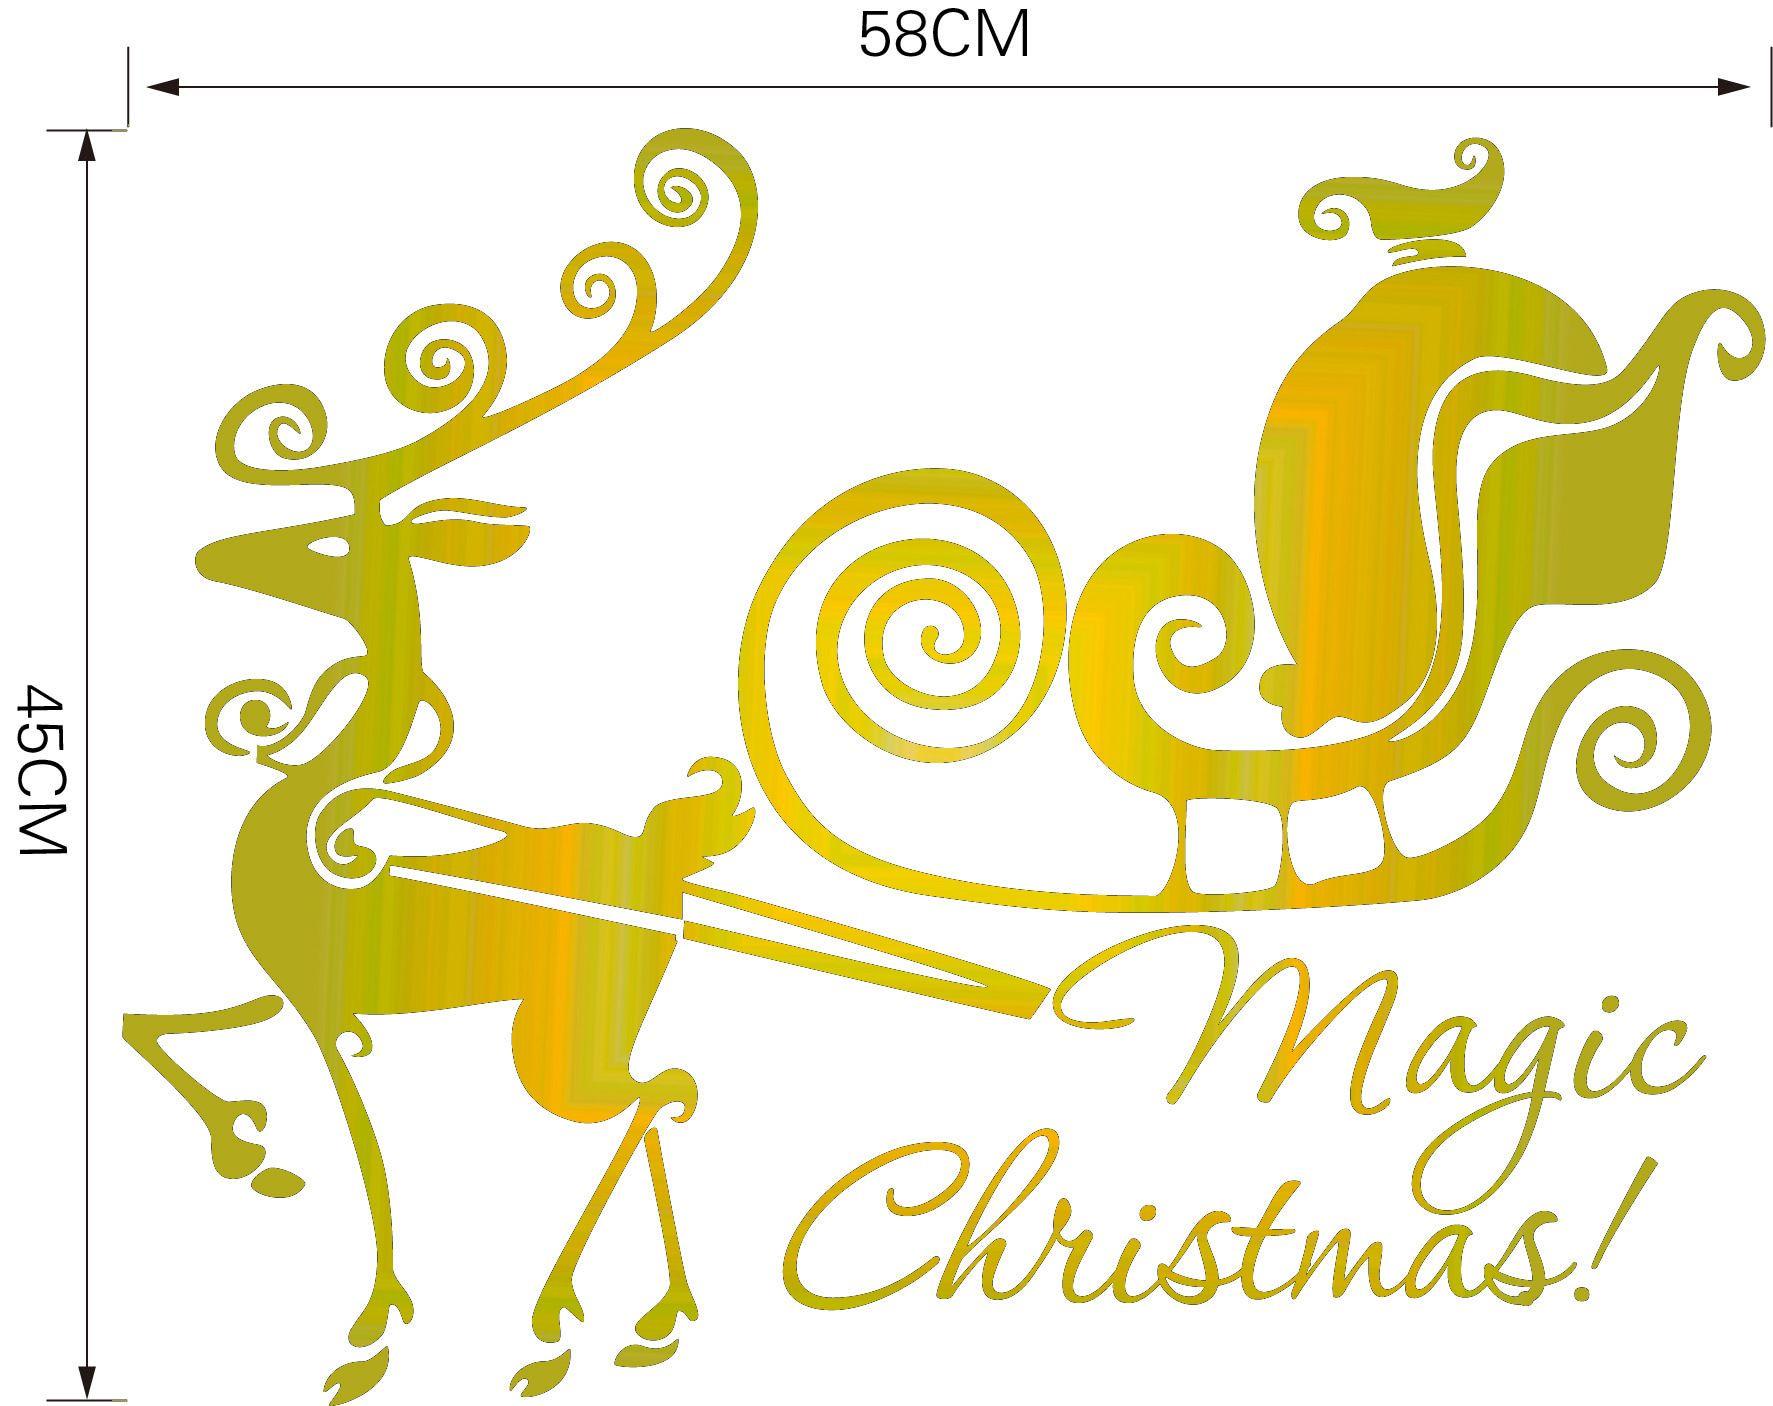 Christmas Decoration Decal Home Wall Wallpaper Vinyl Wall Sticker ...